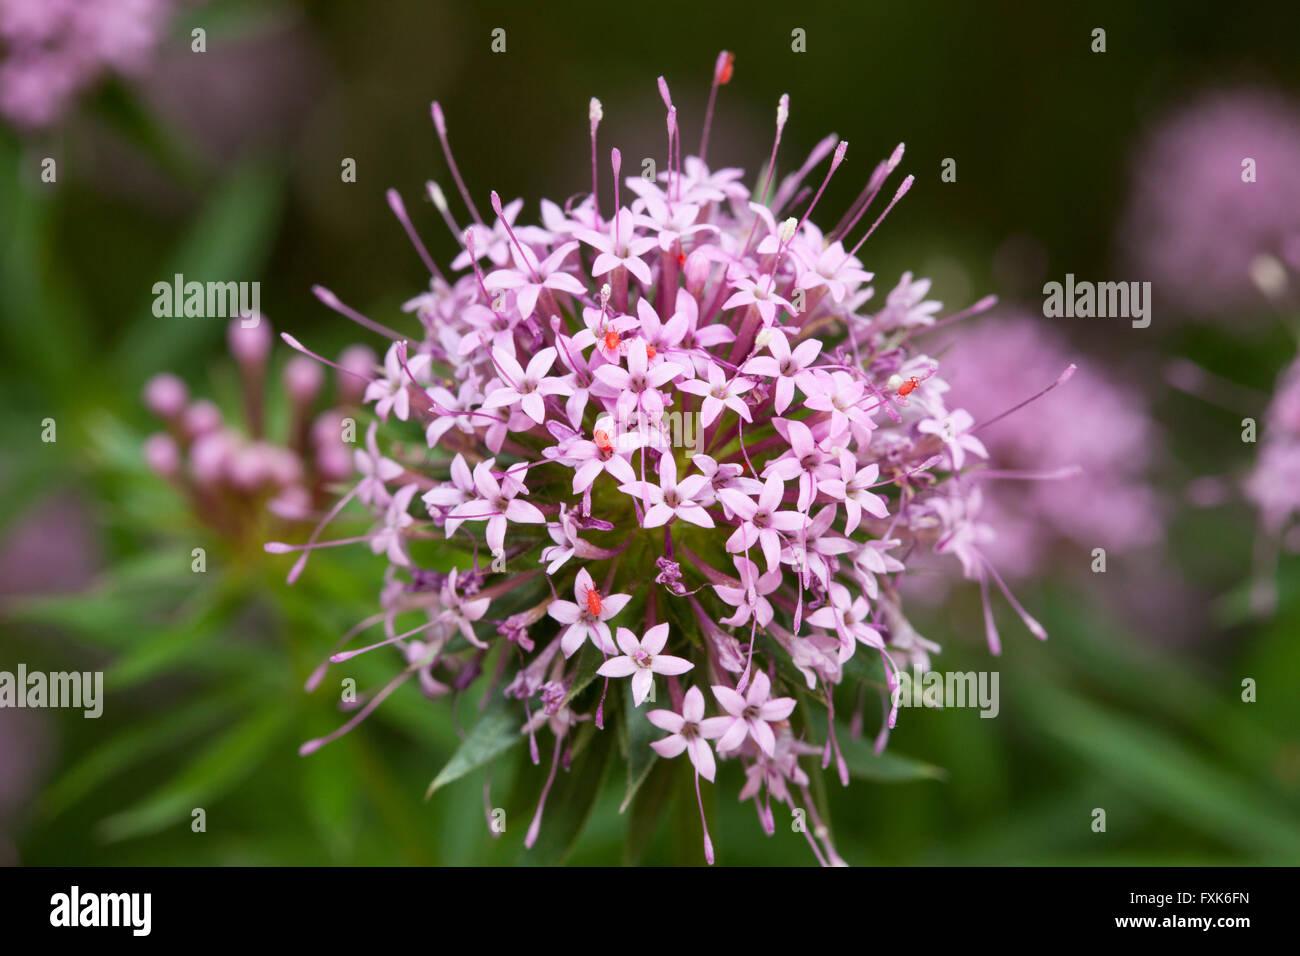 Creeping Crosswort (Phuopsis stylosa) - Stock Image